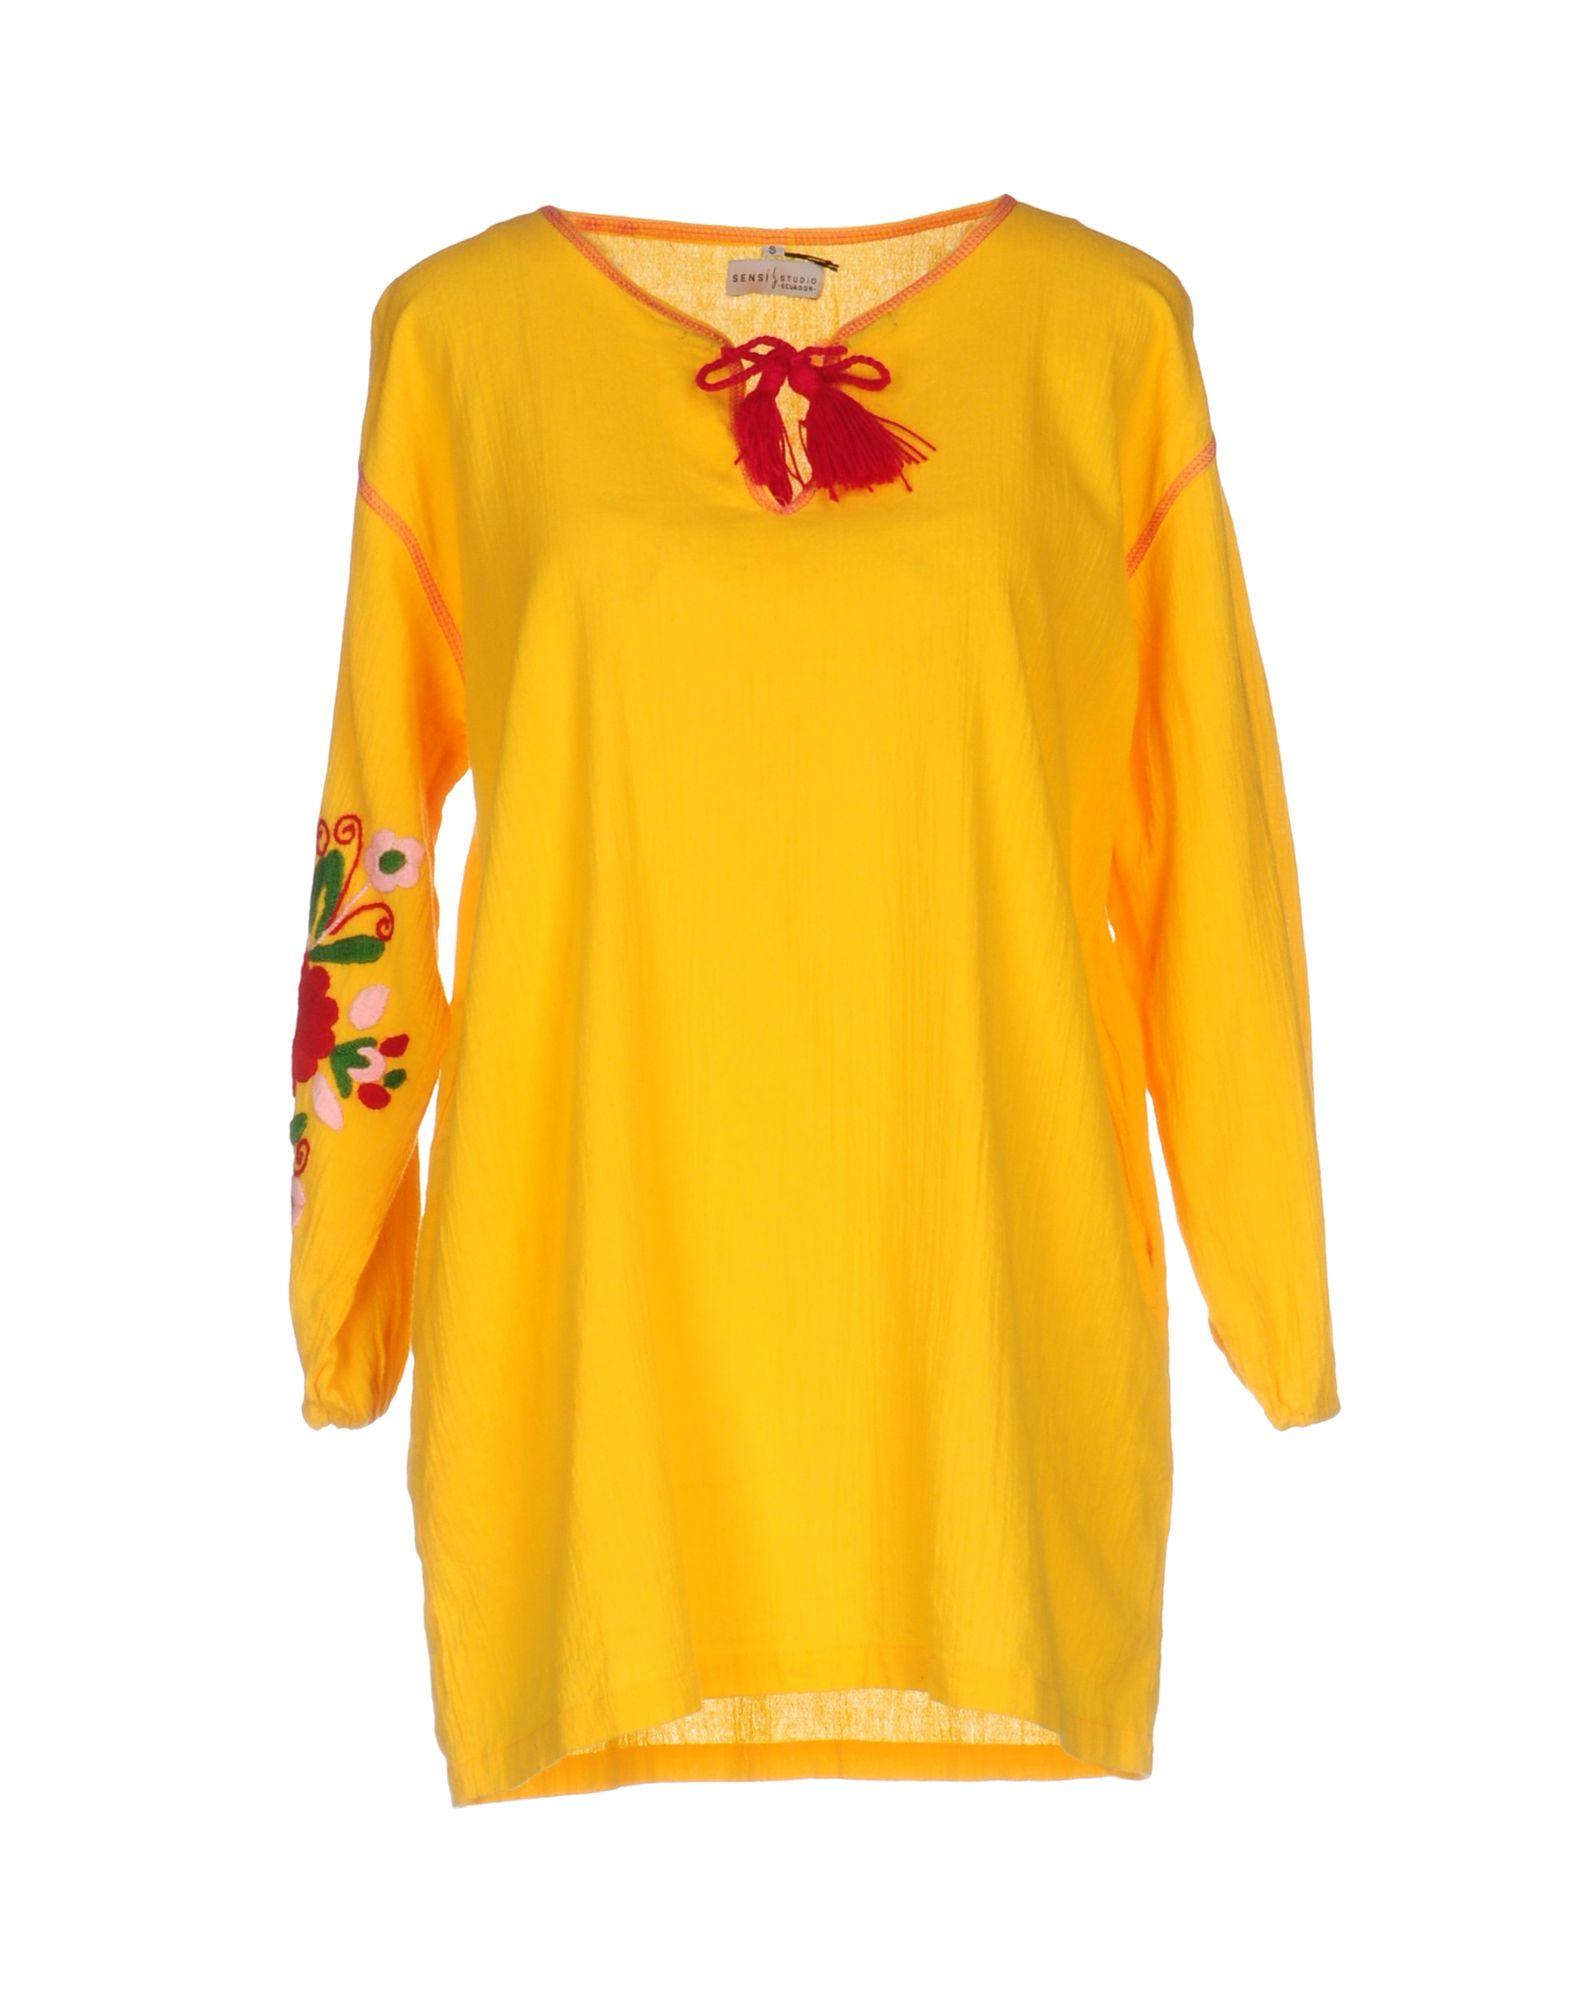 SENSI STUDIO Короткое платье sensi lupetto mc ma496m 1